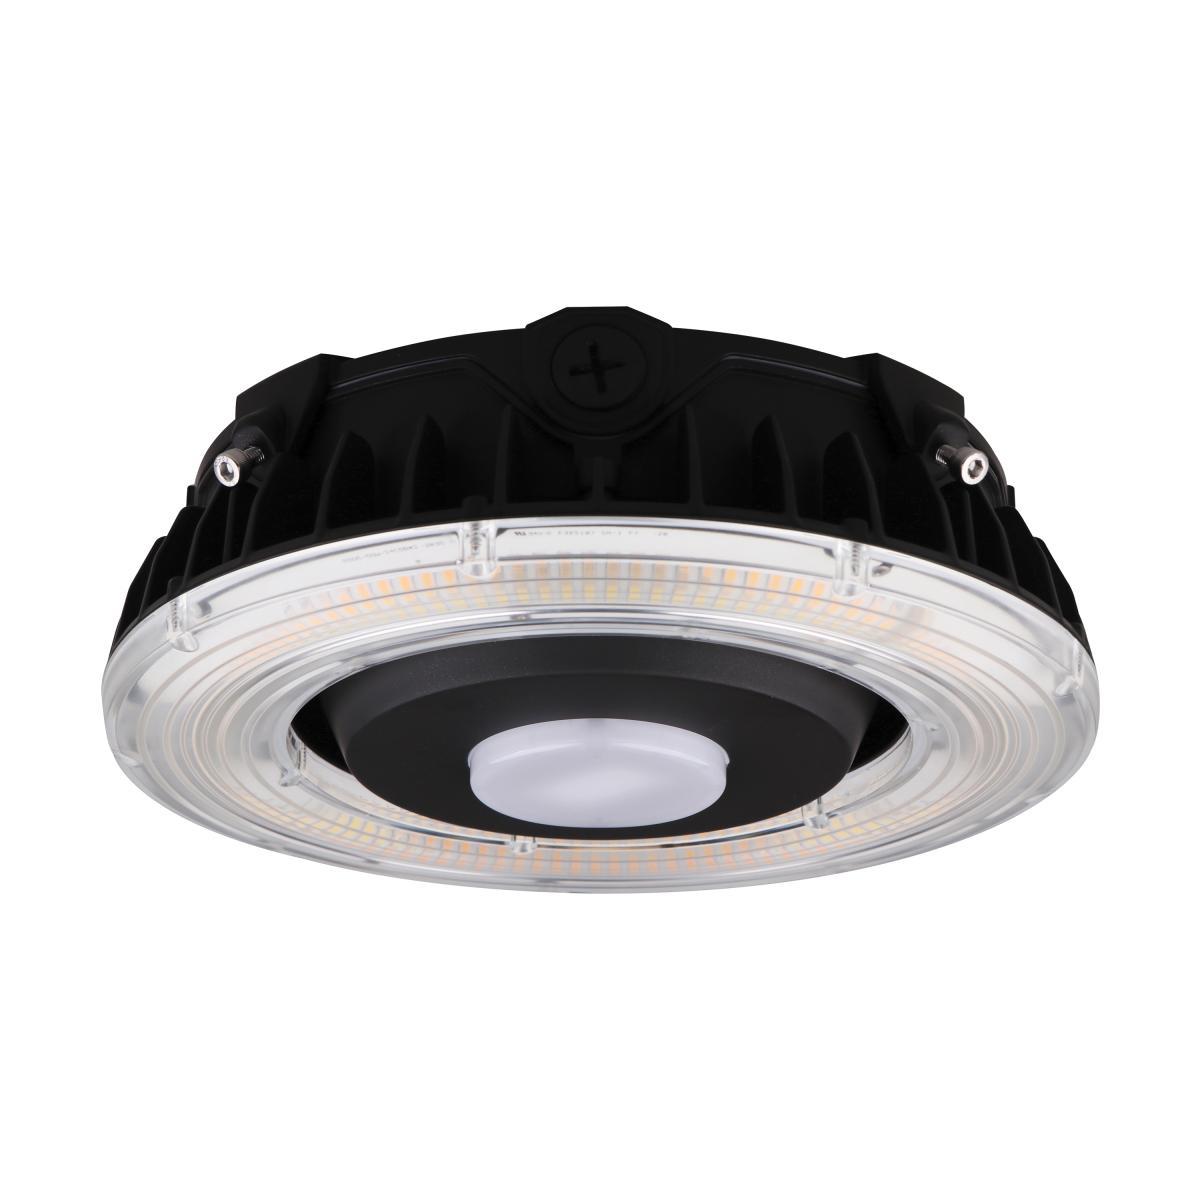 65-626 40W LED CANOPY LIGHT